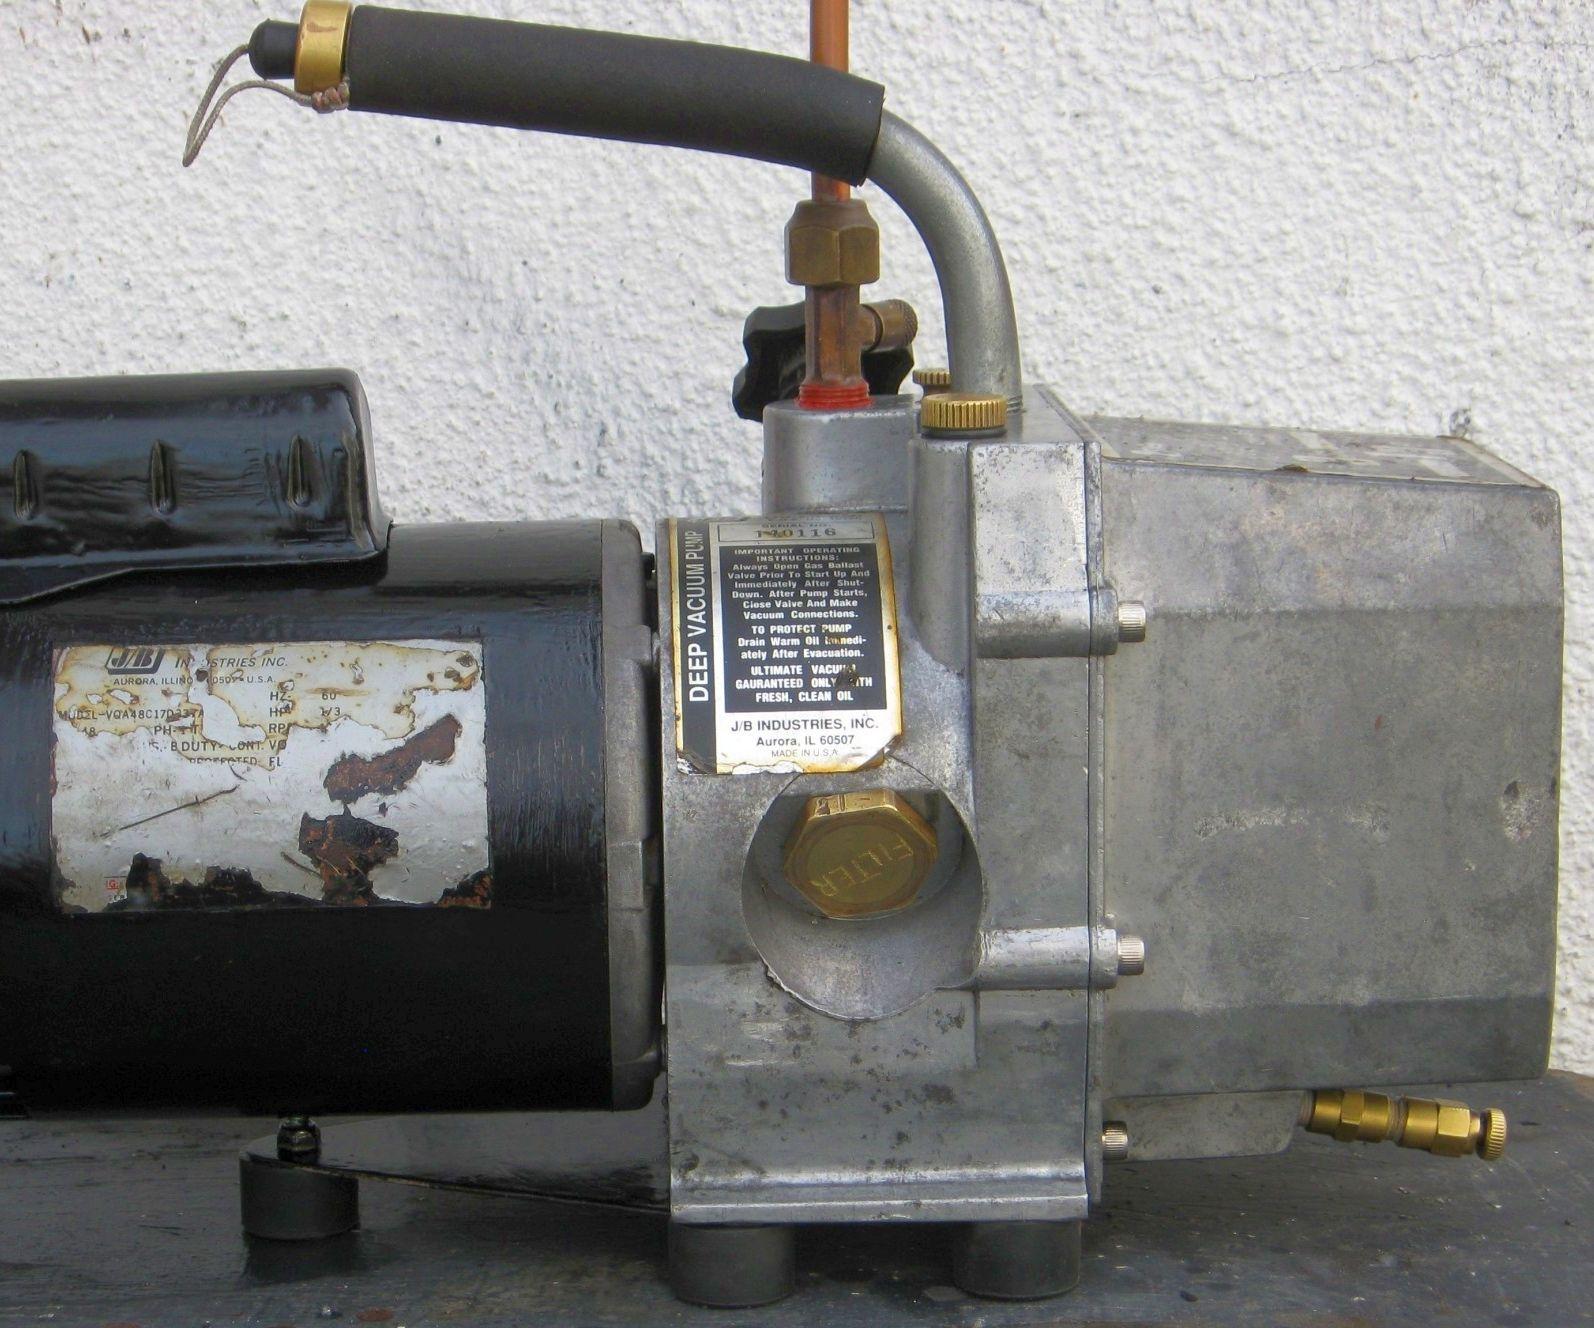 Repair and Rebuild a Deep Vacuum Pump, the JB Industries DV85.